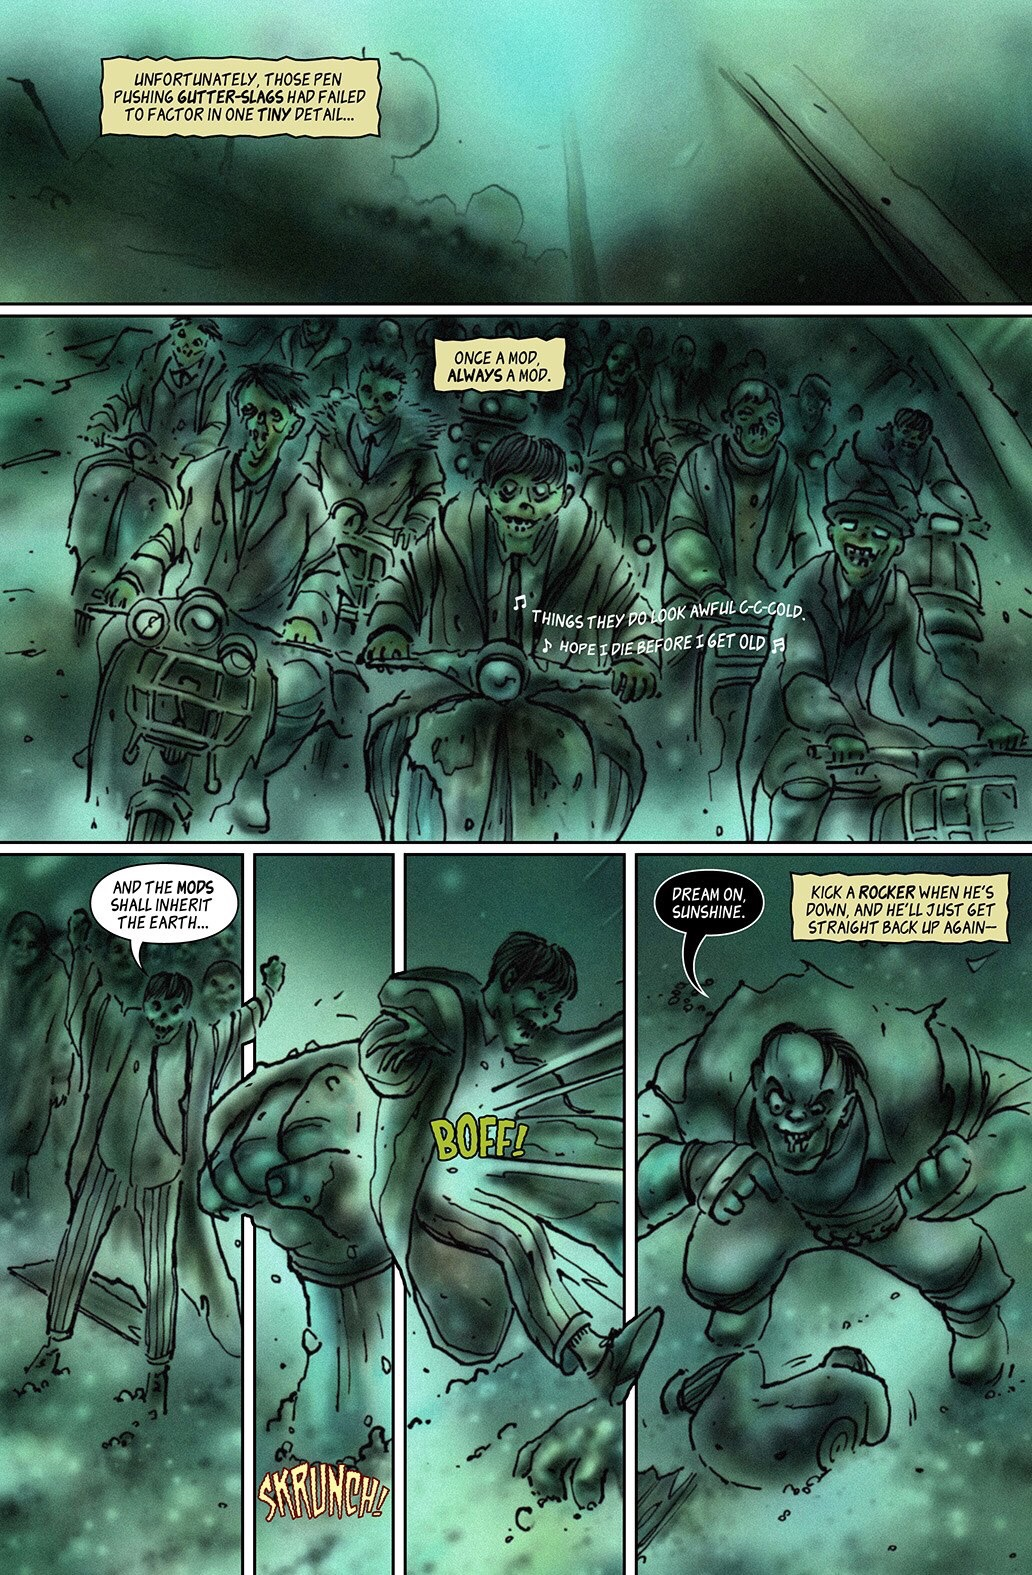 100% Biodegradable Issue 19 - Mods vs Mutants